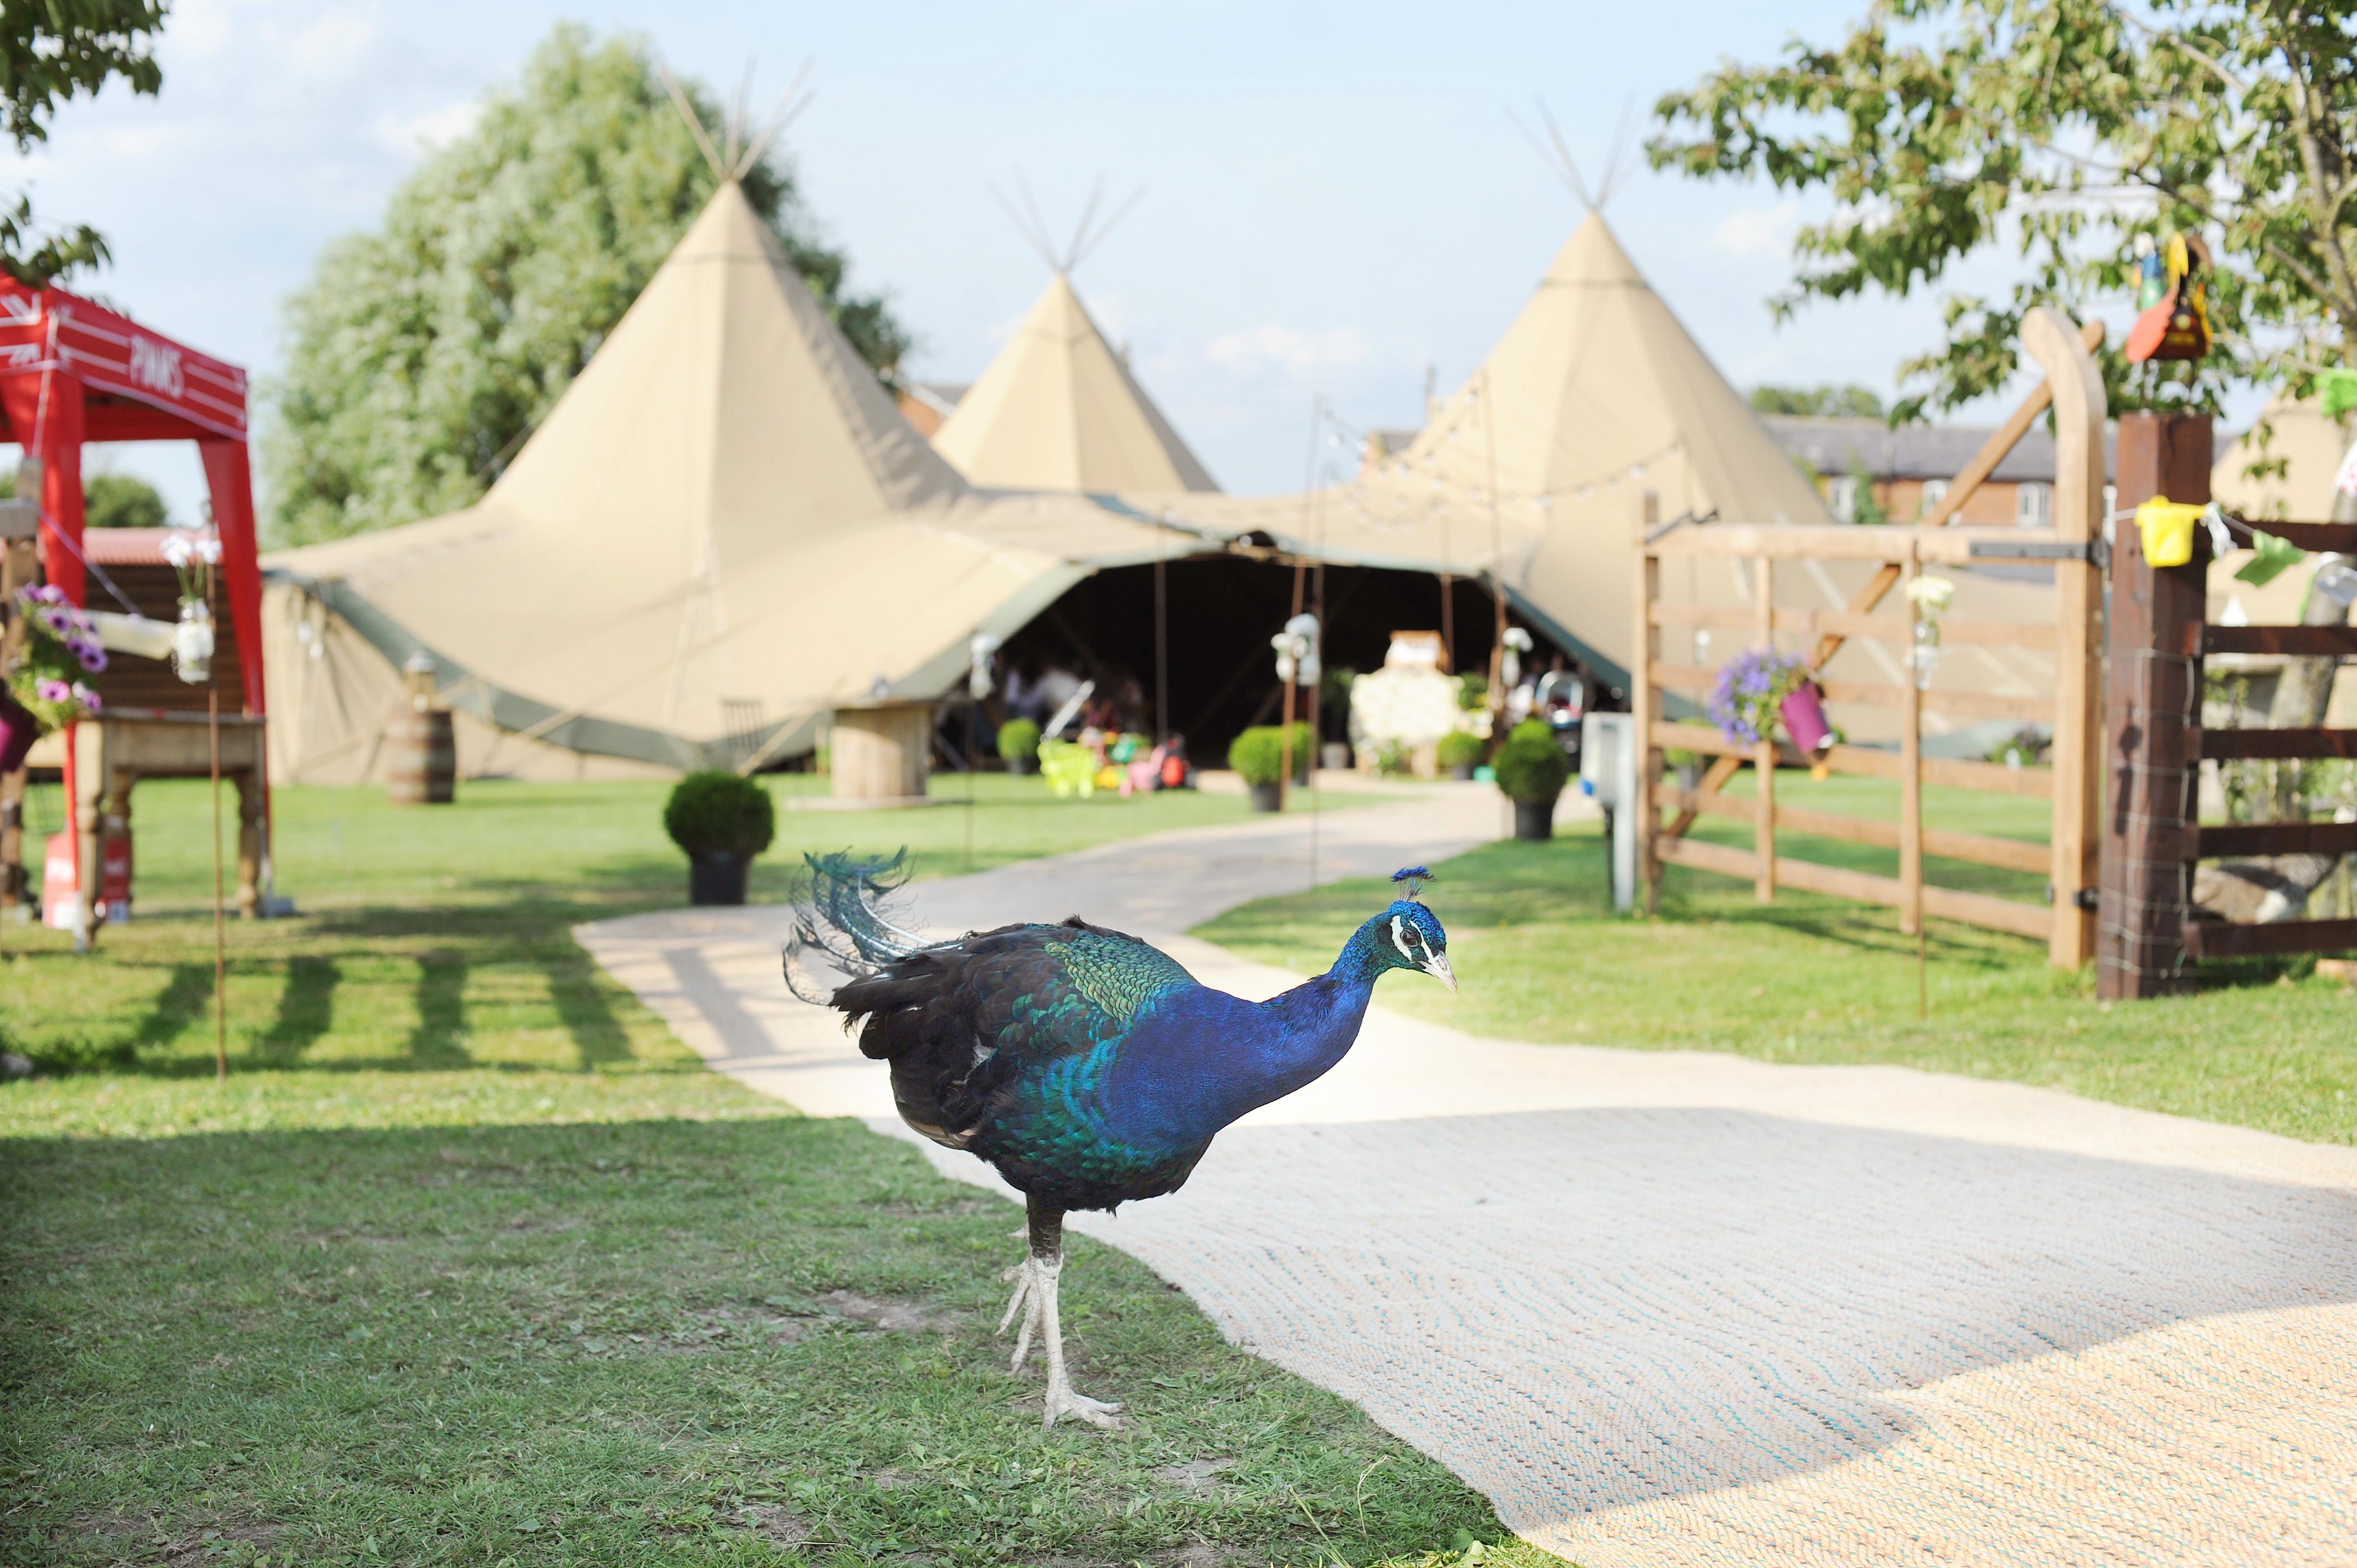 PapaKata Teepees with Skipbridge Country Weddings venue resident peacock